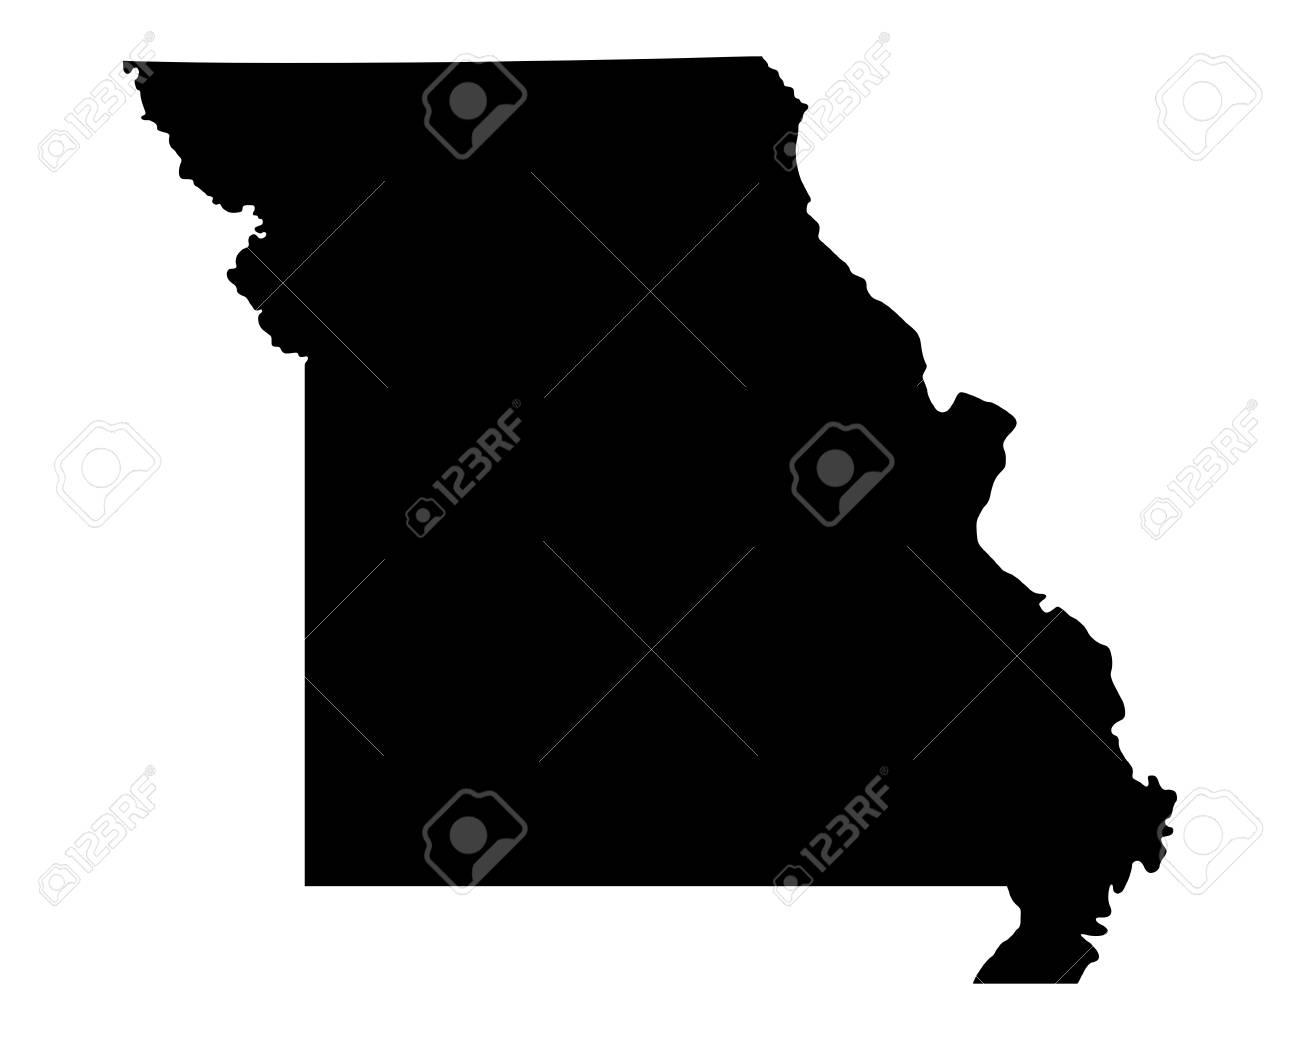 Map of Missouri - 24193862